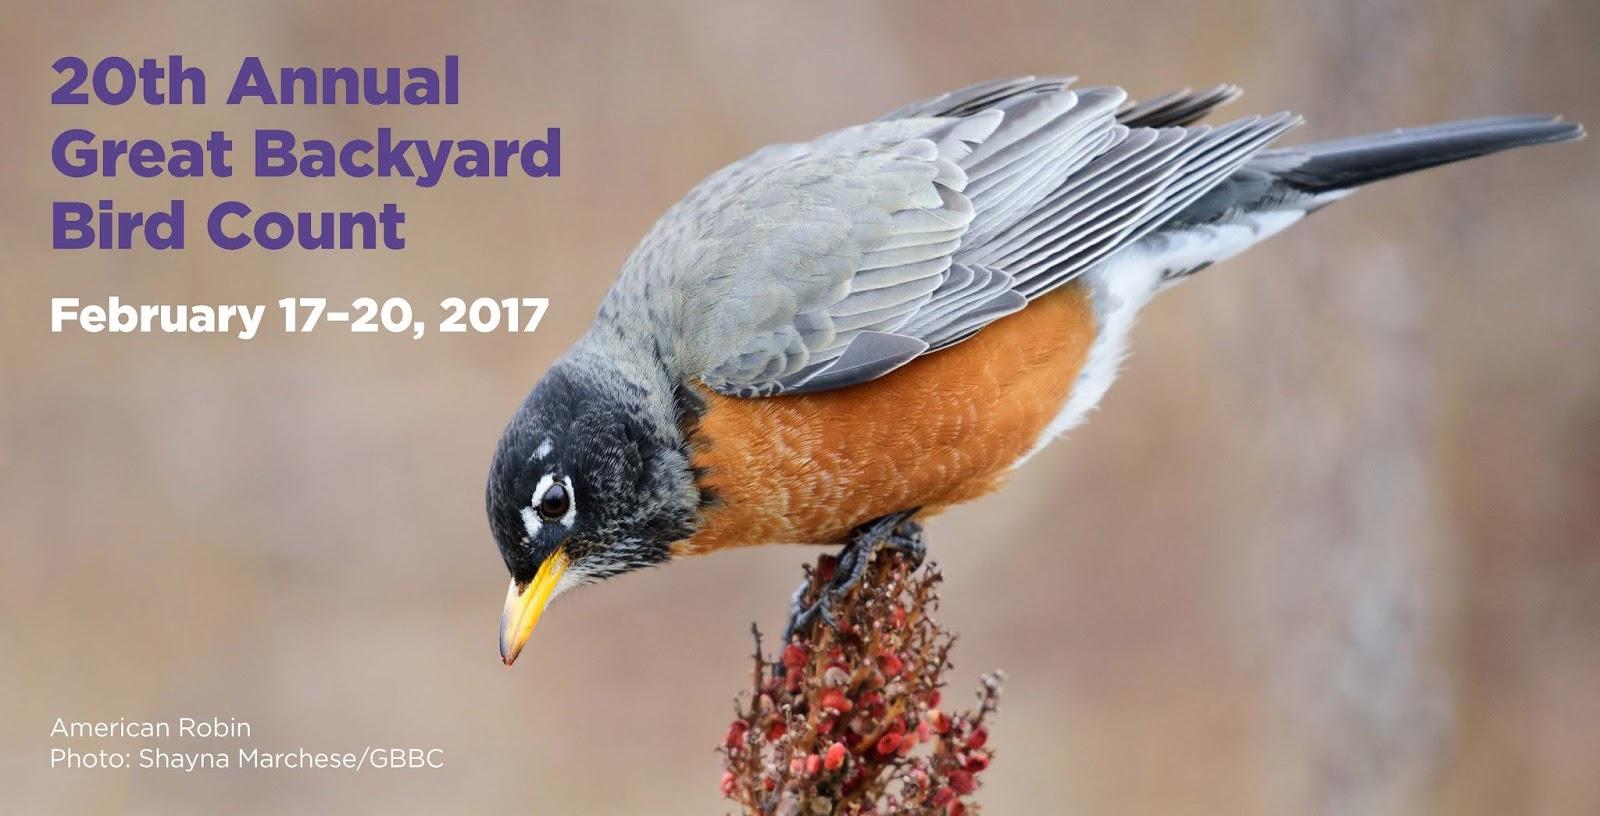 bethlehem birdman 39 s tips backyard bird count is february 17 20